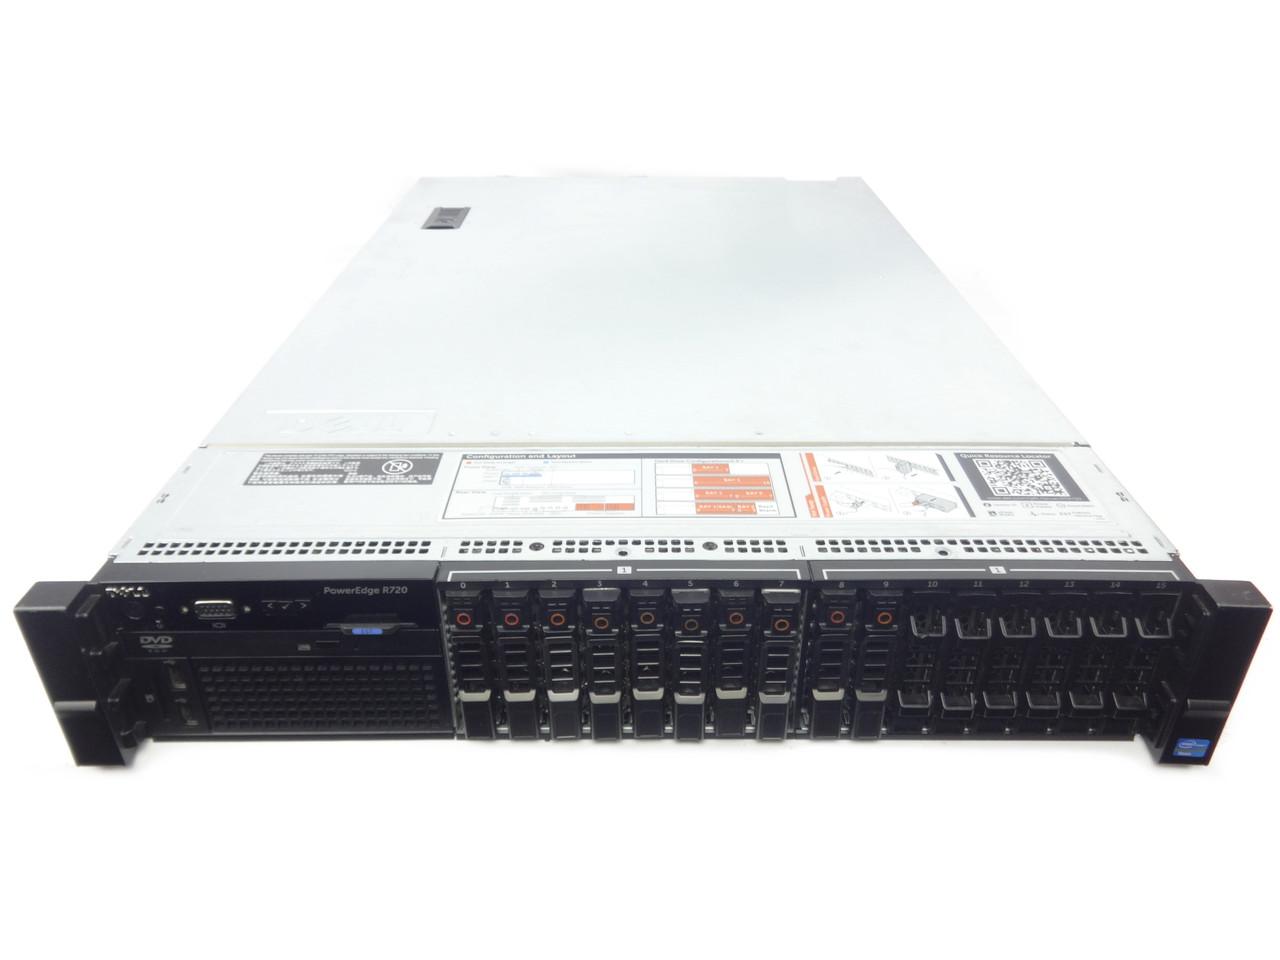 Poweredge R720 16 Bay Server